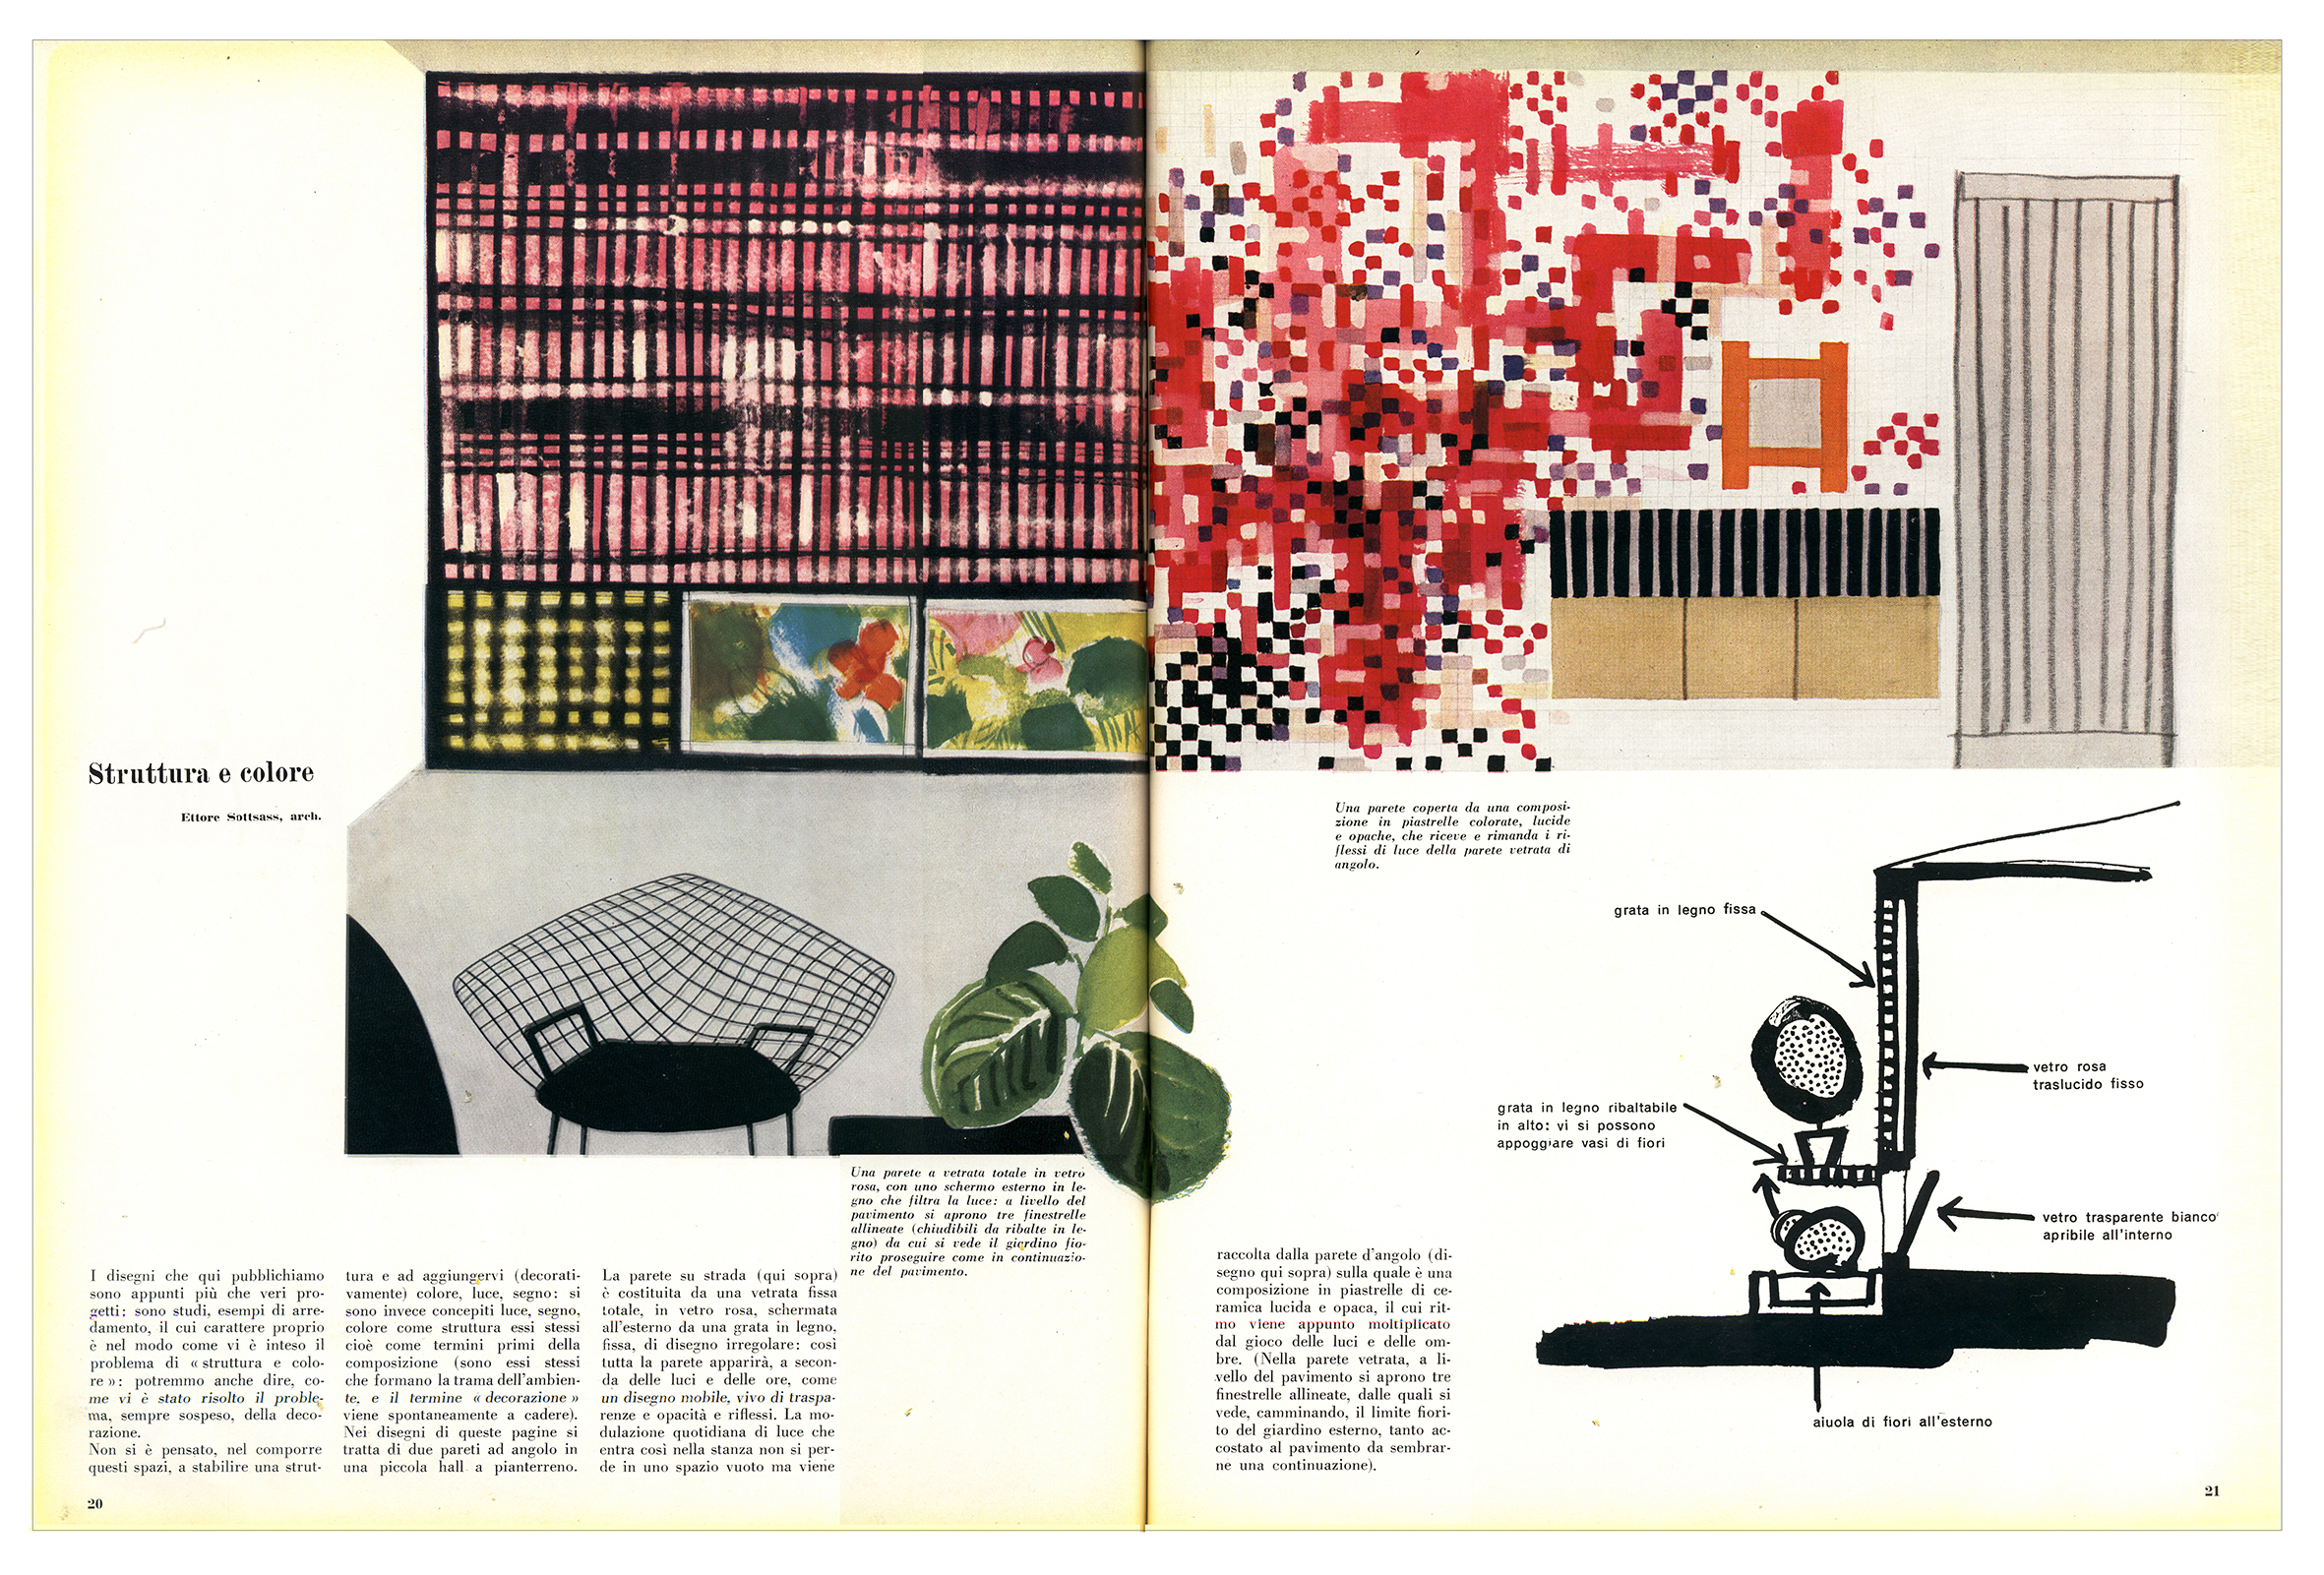 Clino Trini Castelli Archives - AIS Design 88c34f3b9dbb